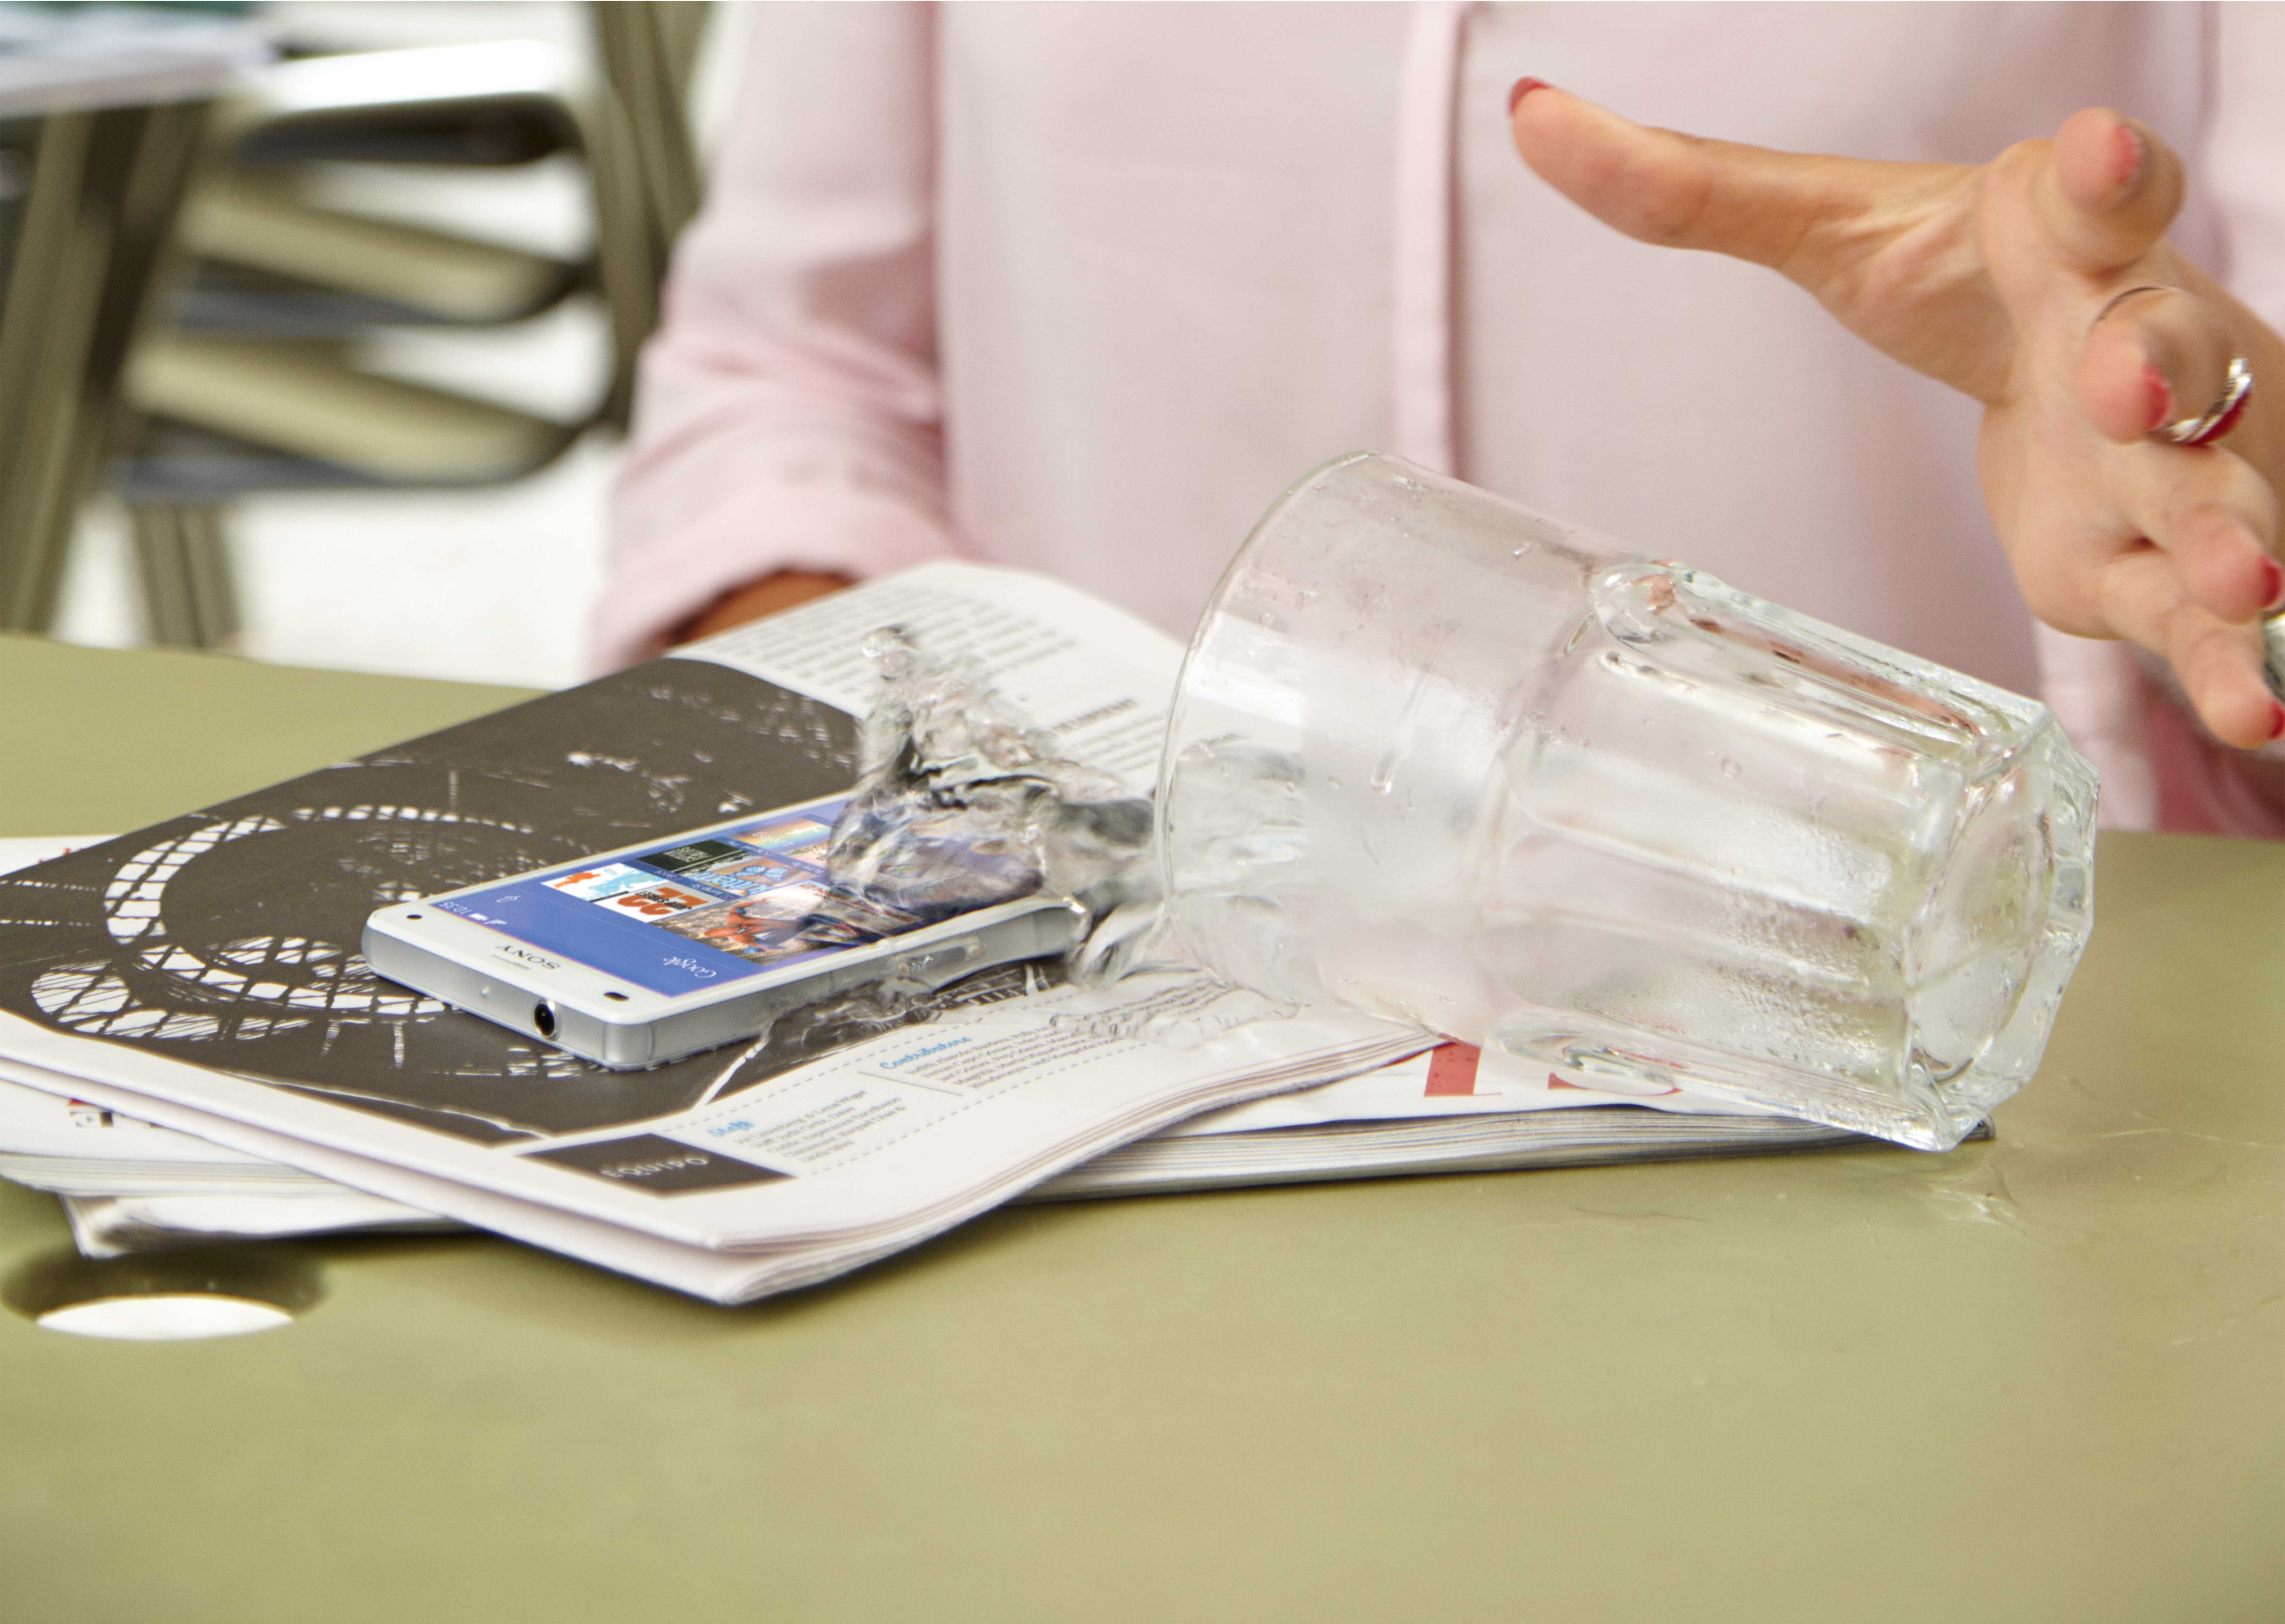 Sony Xperia Z3 și Xperia Z3 Compact – cea mai puternică frăție [VIDEO]